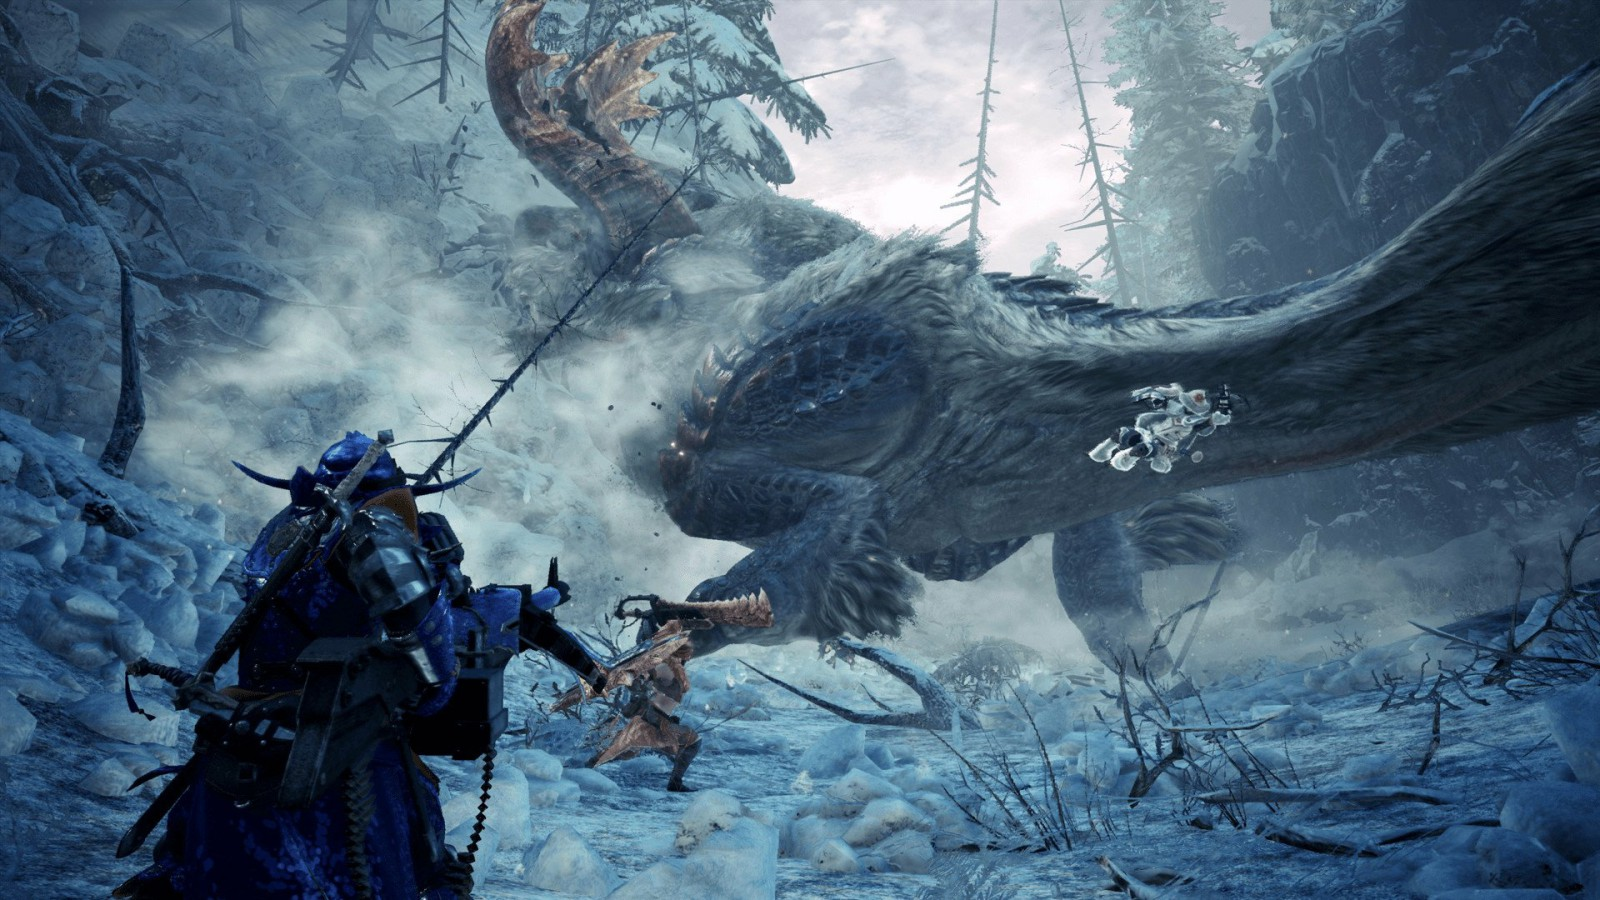 PC版《怪物猎人 世界:冰原世纪》出现存档丢失问题,Capcom正在调查